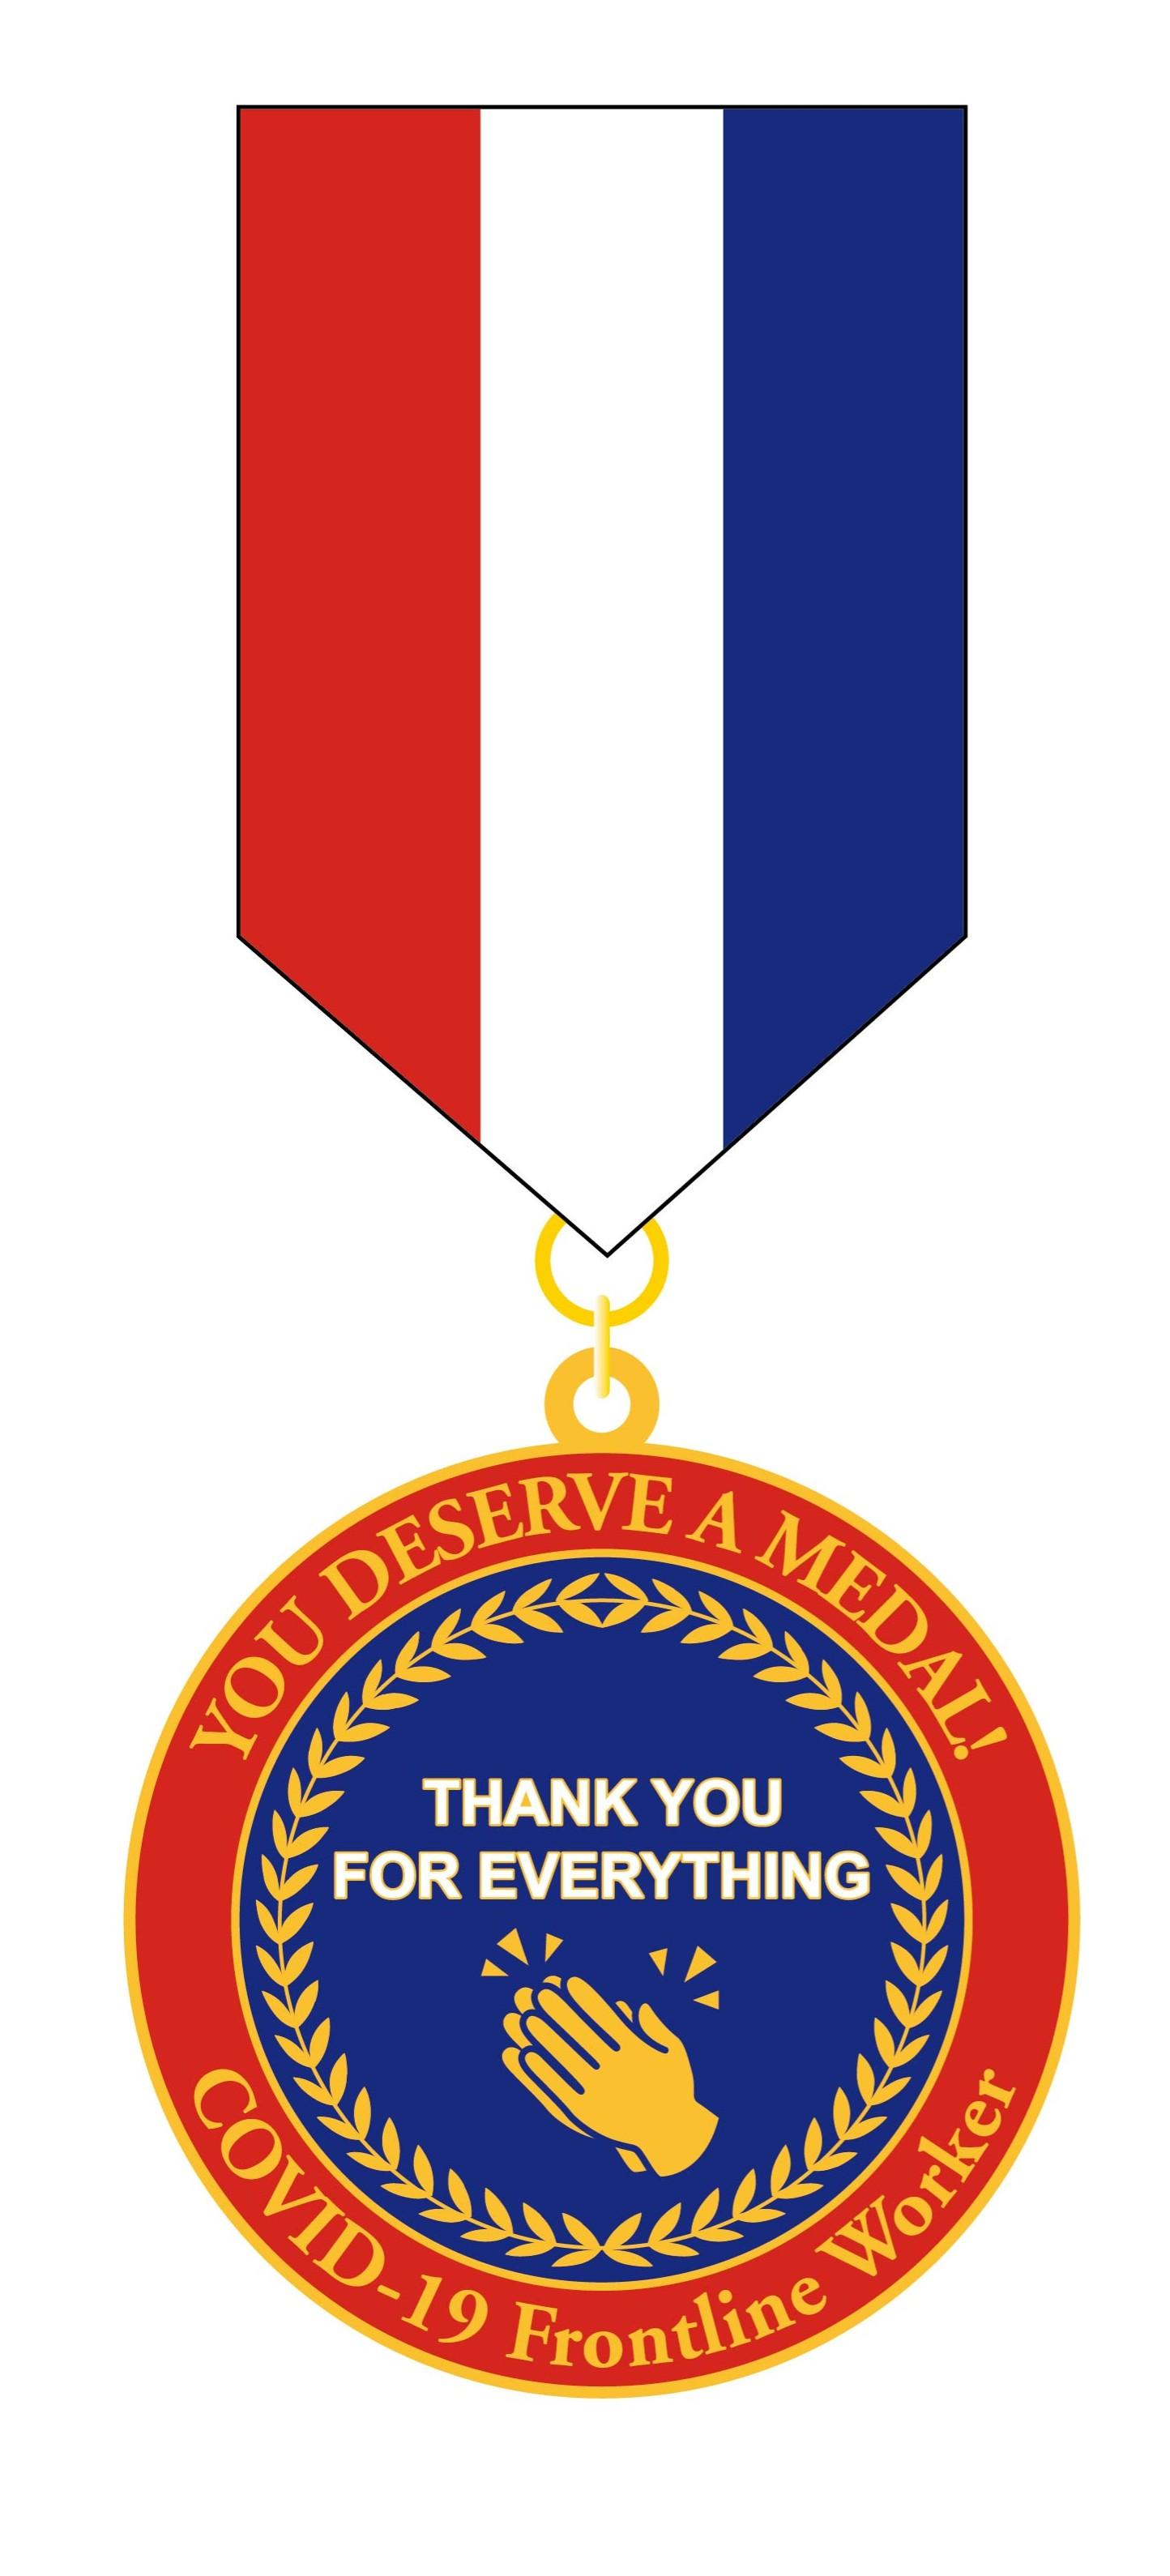 Frontline Worker Covid-19 Medal